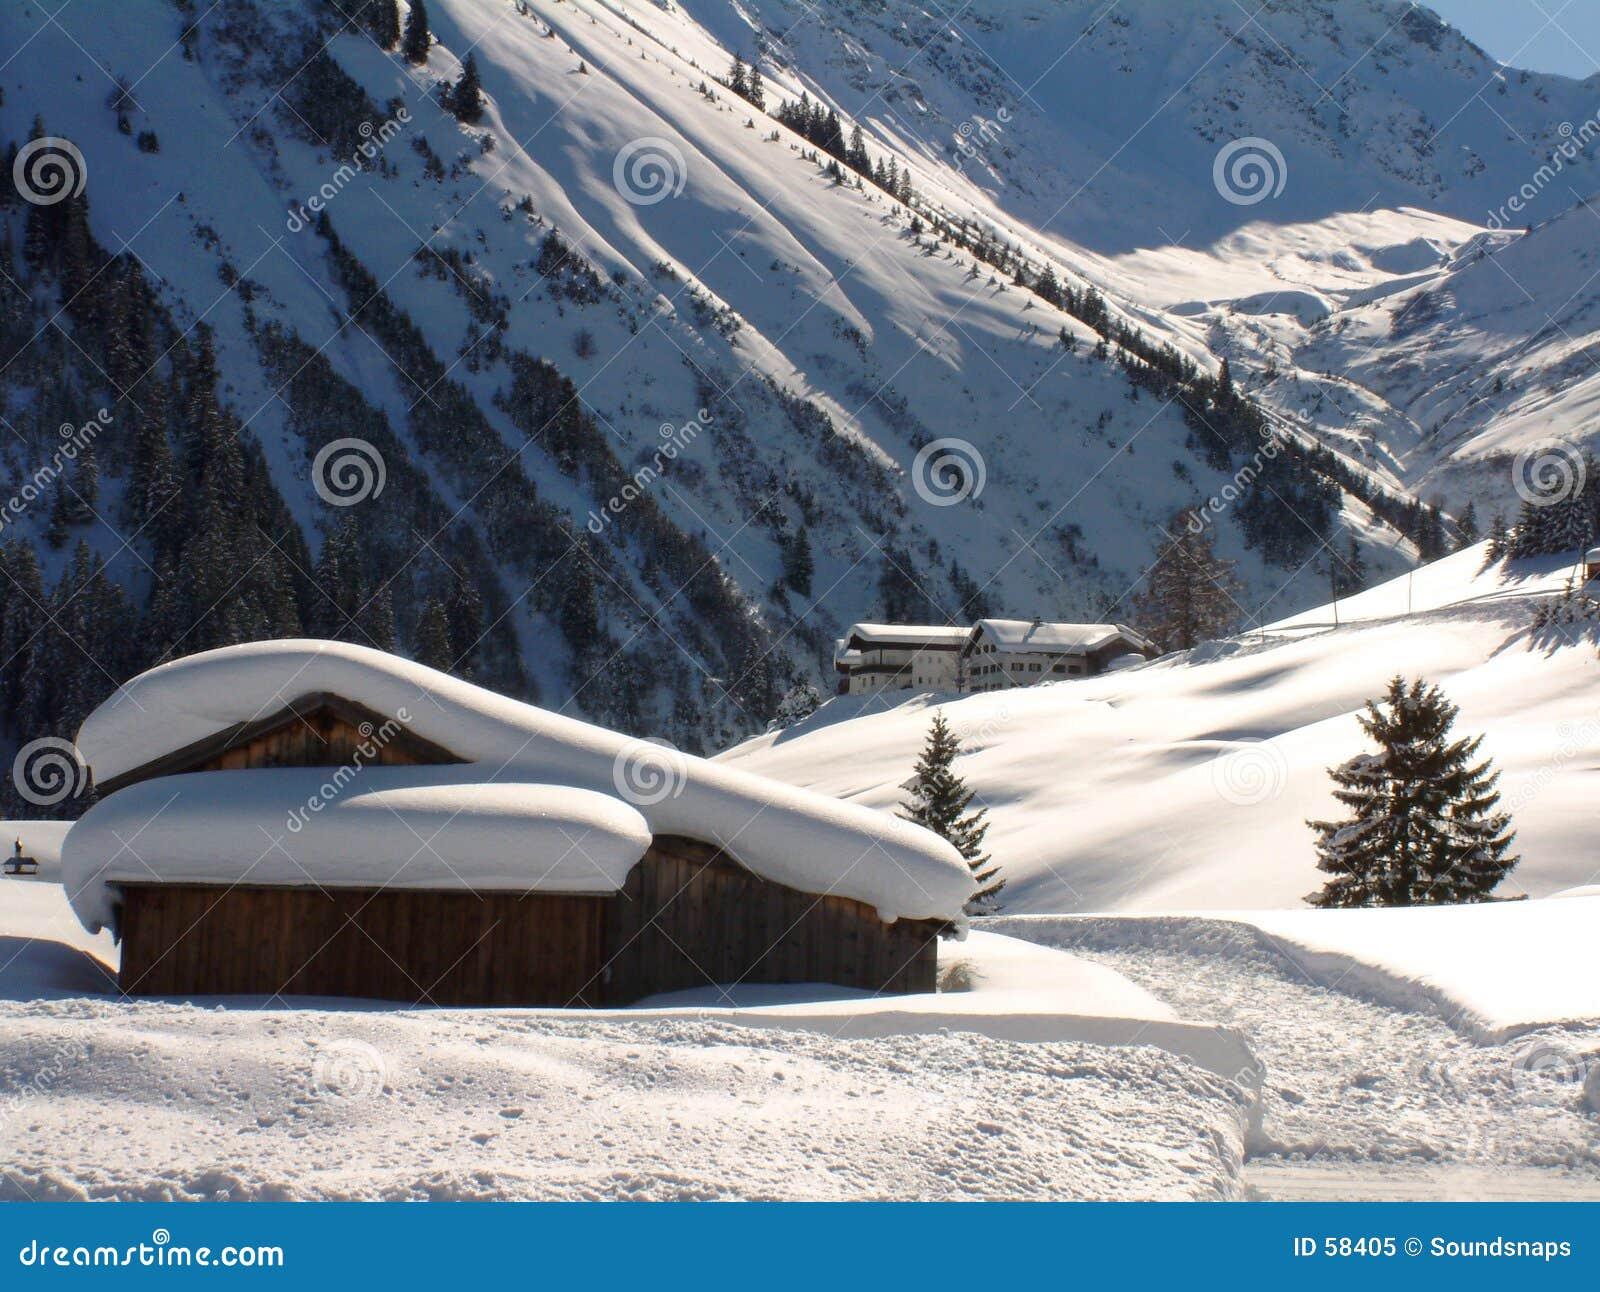 Austrian Alpine winter scene